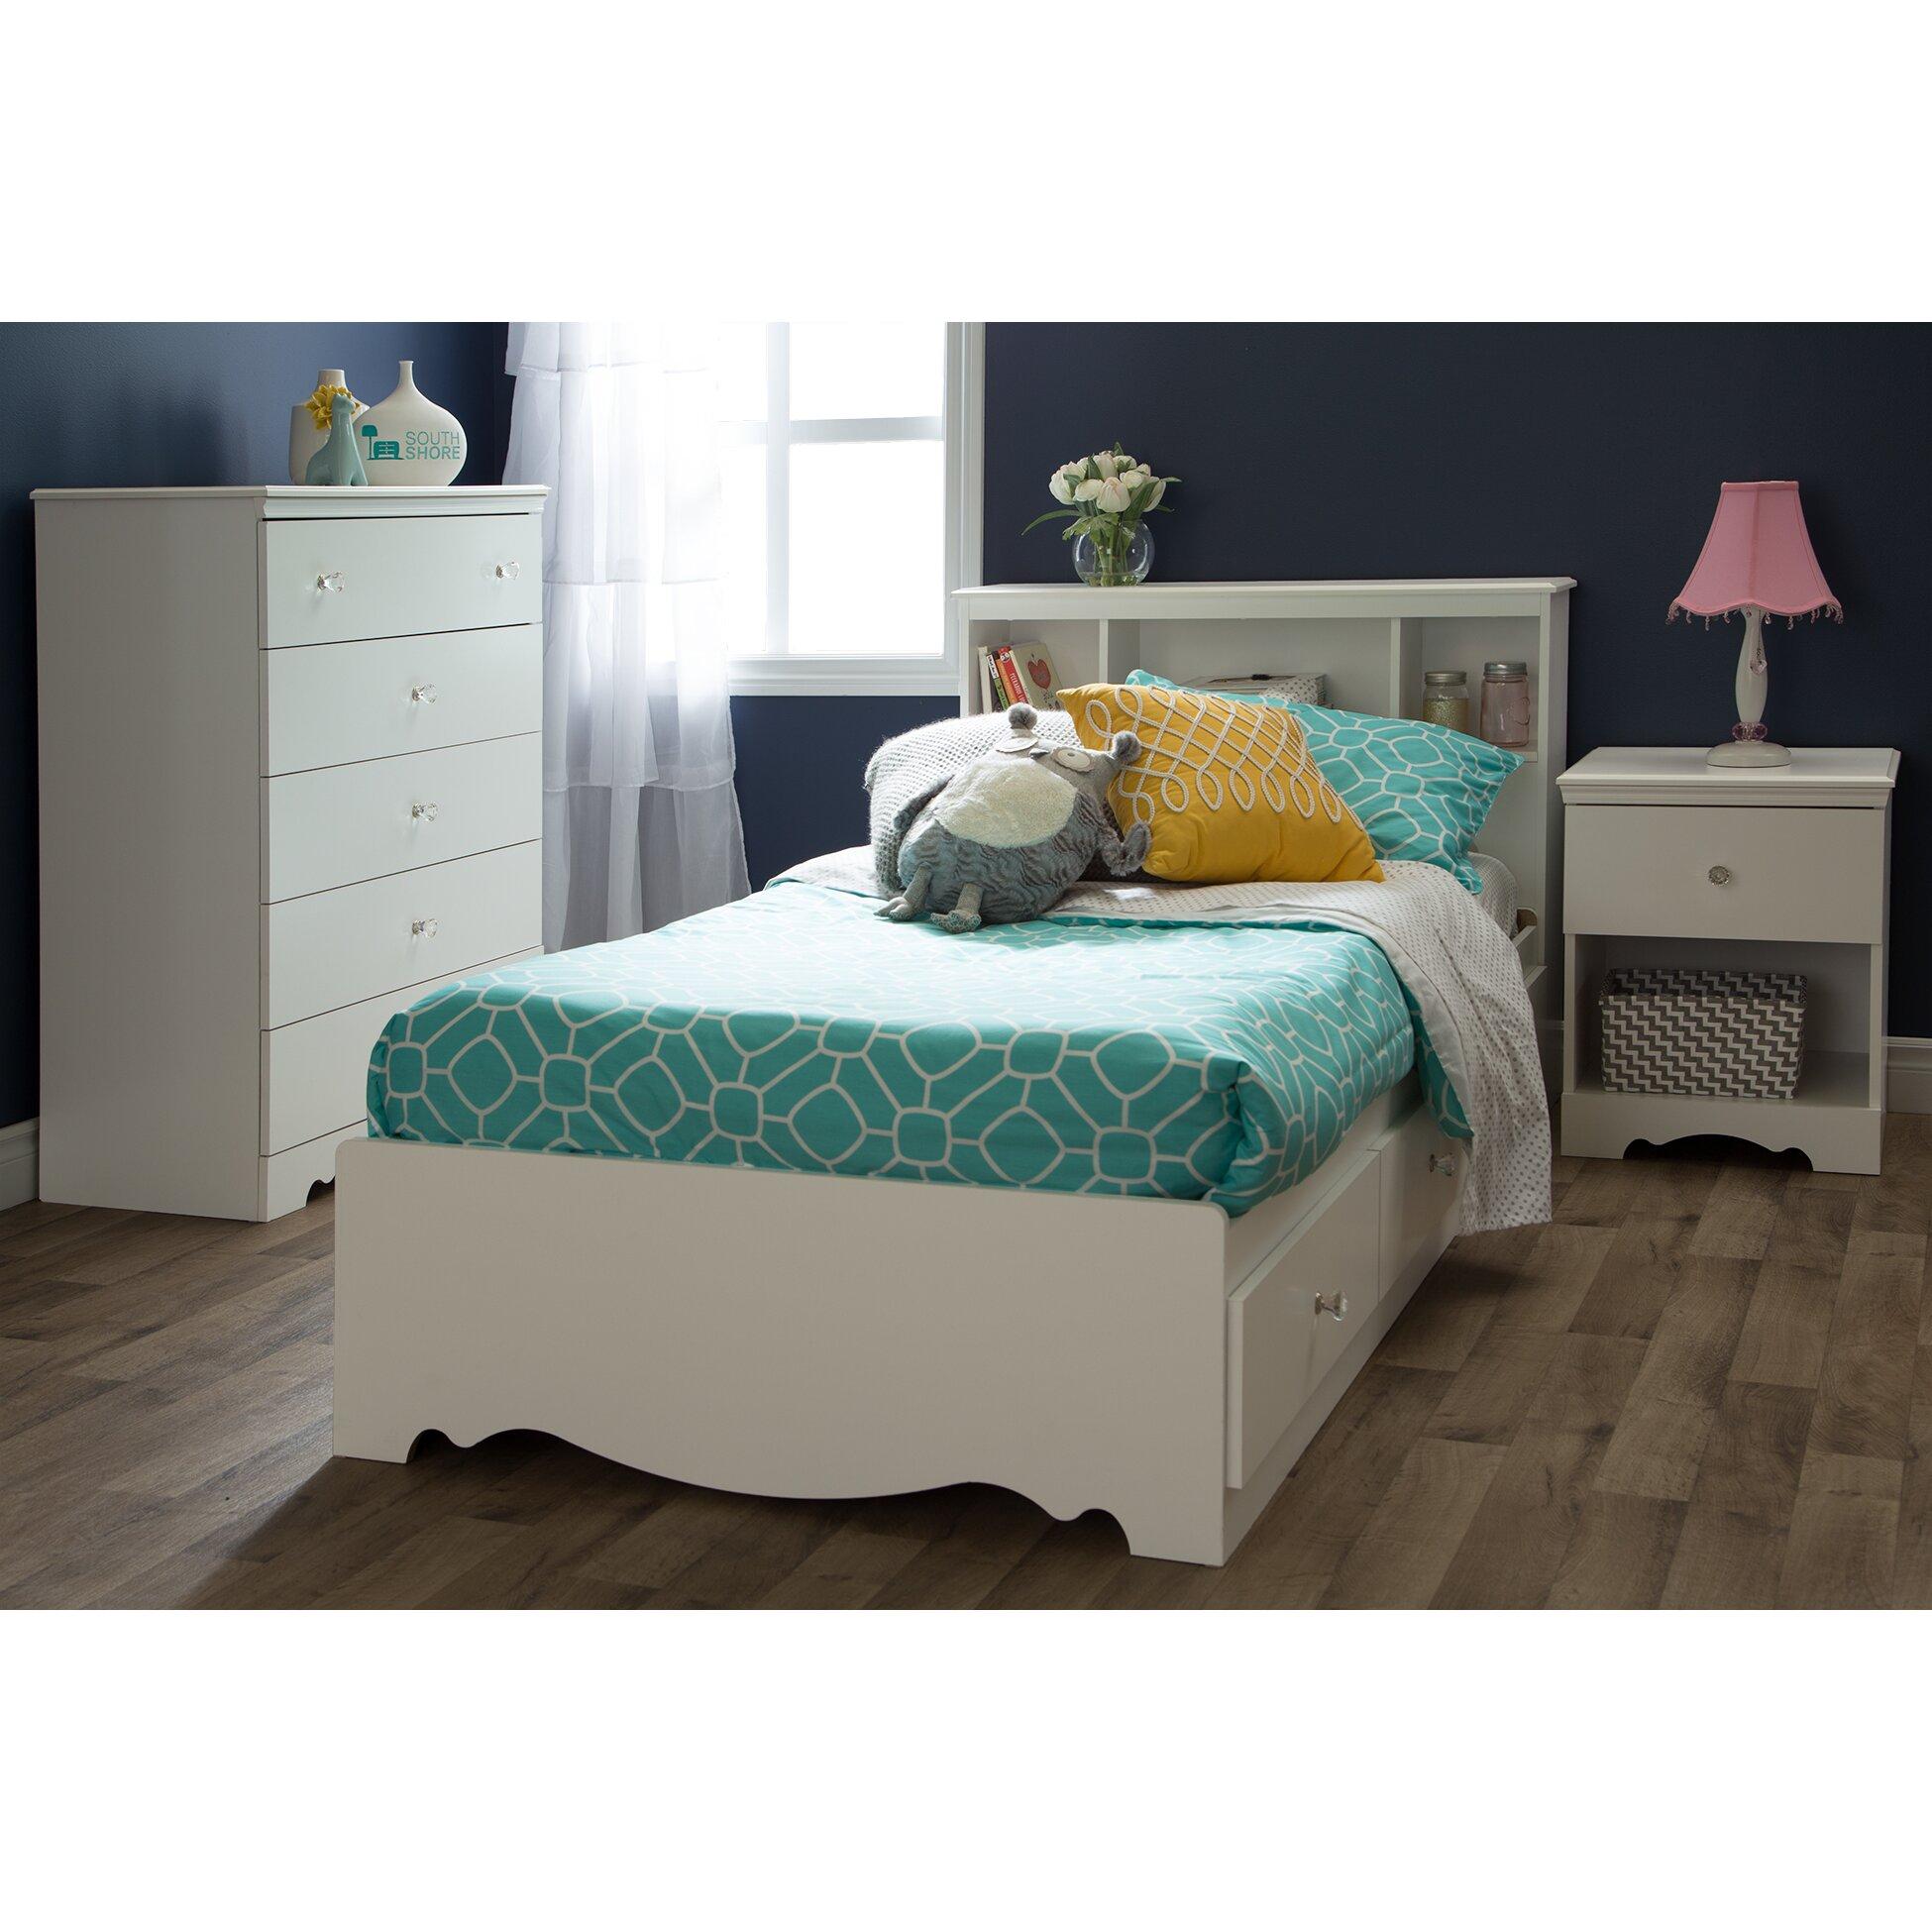 South shore crystal platform customizable bedroom set - South shore furniture bedroom sets ...